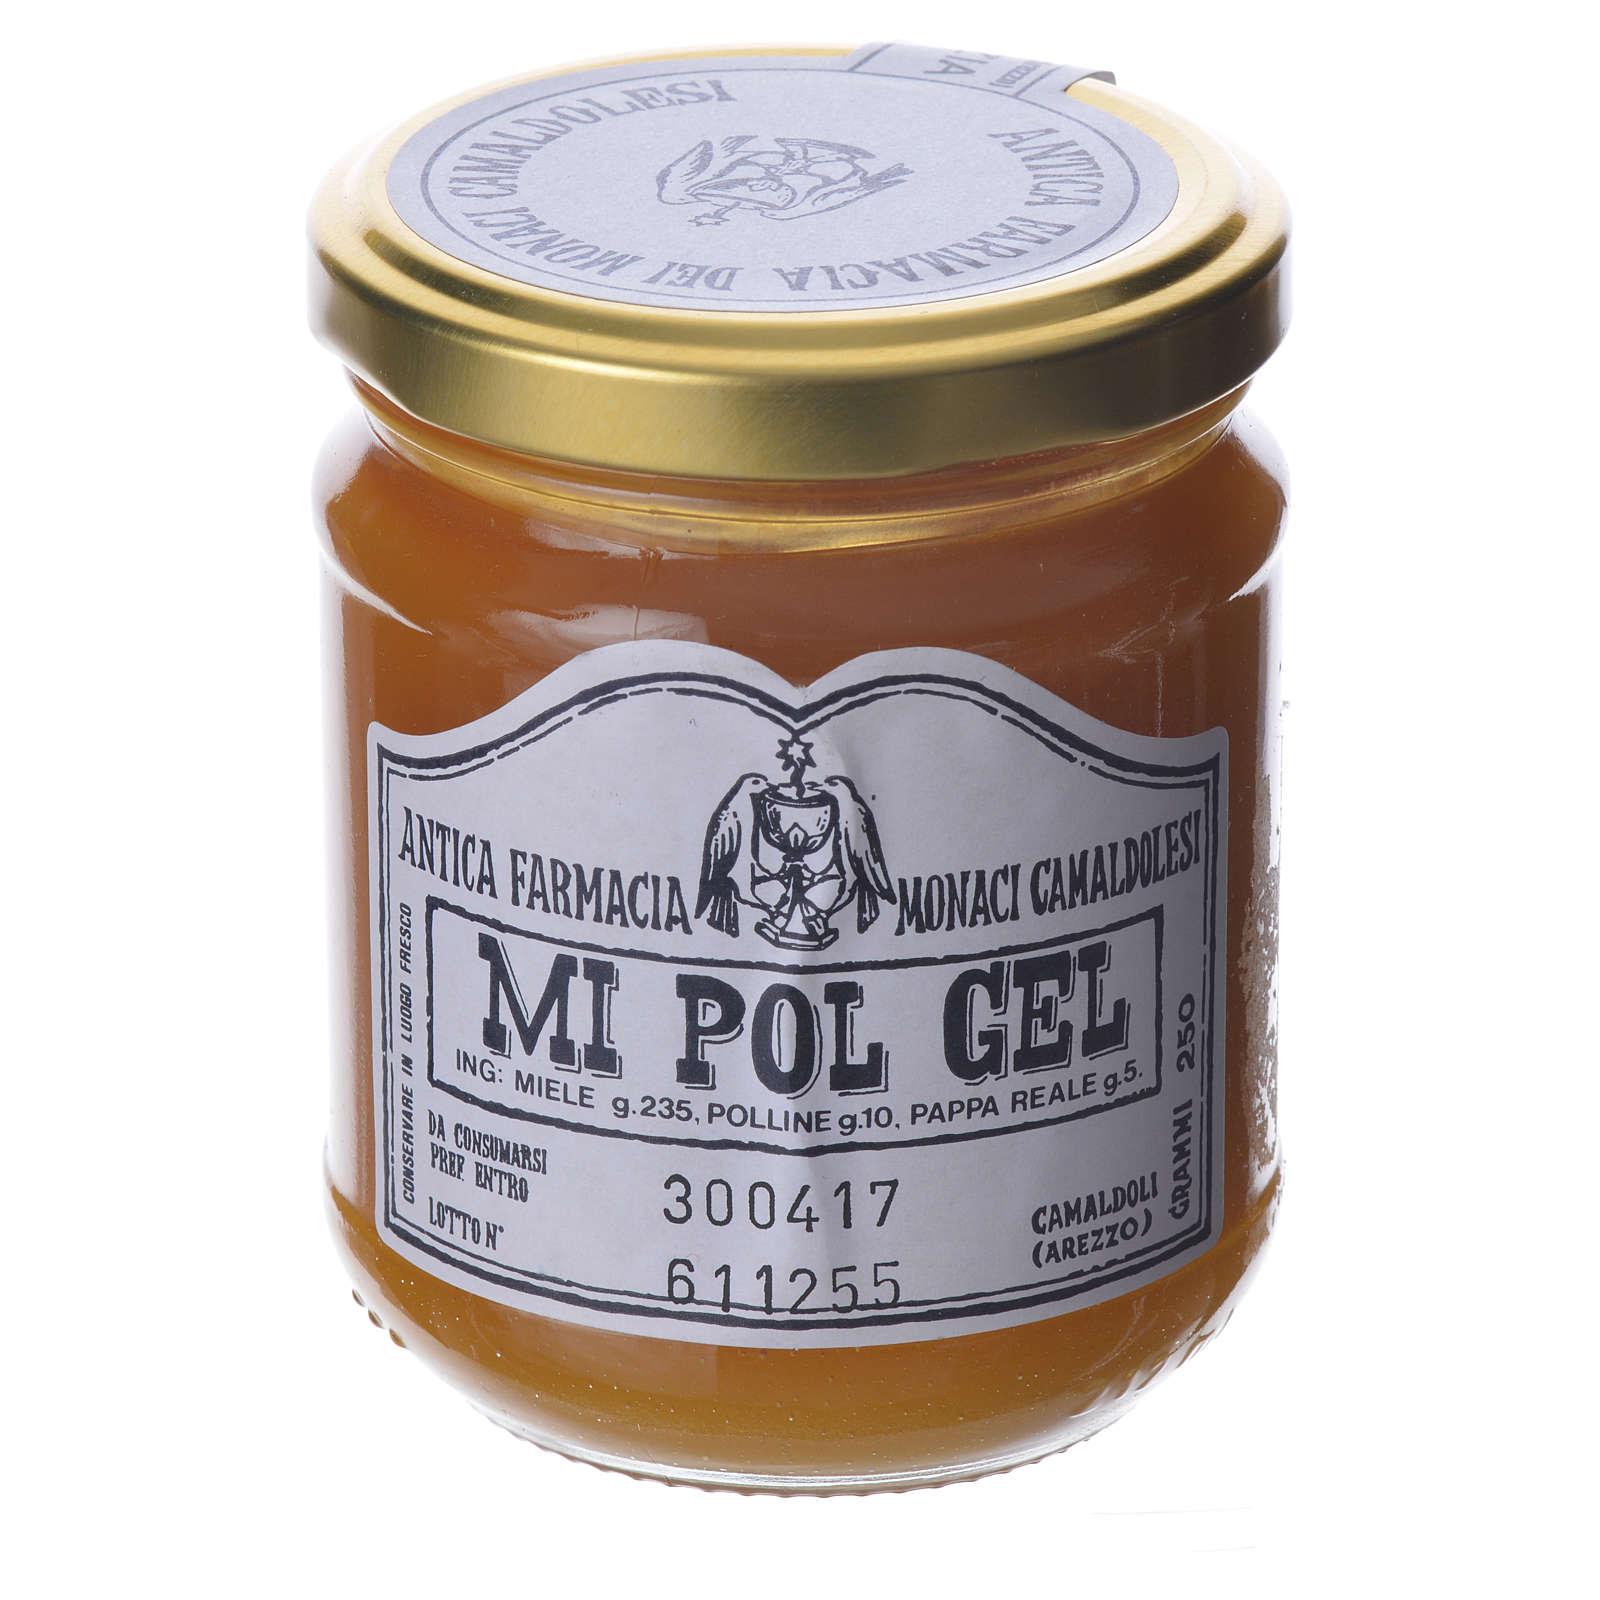 MI POL GEL , honey pollen and royal jelly preparation of Camaldoli 250 cm 3